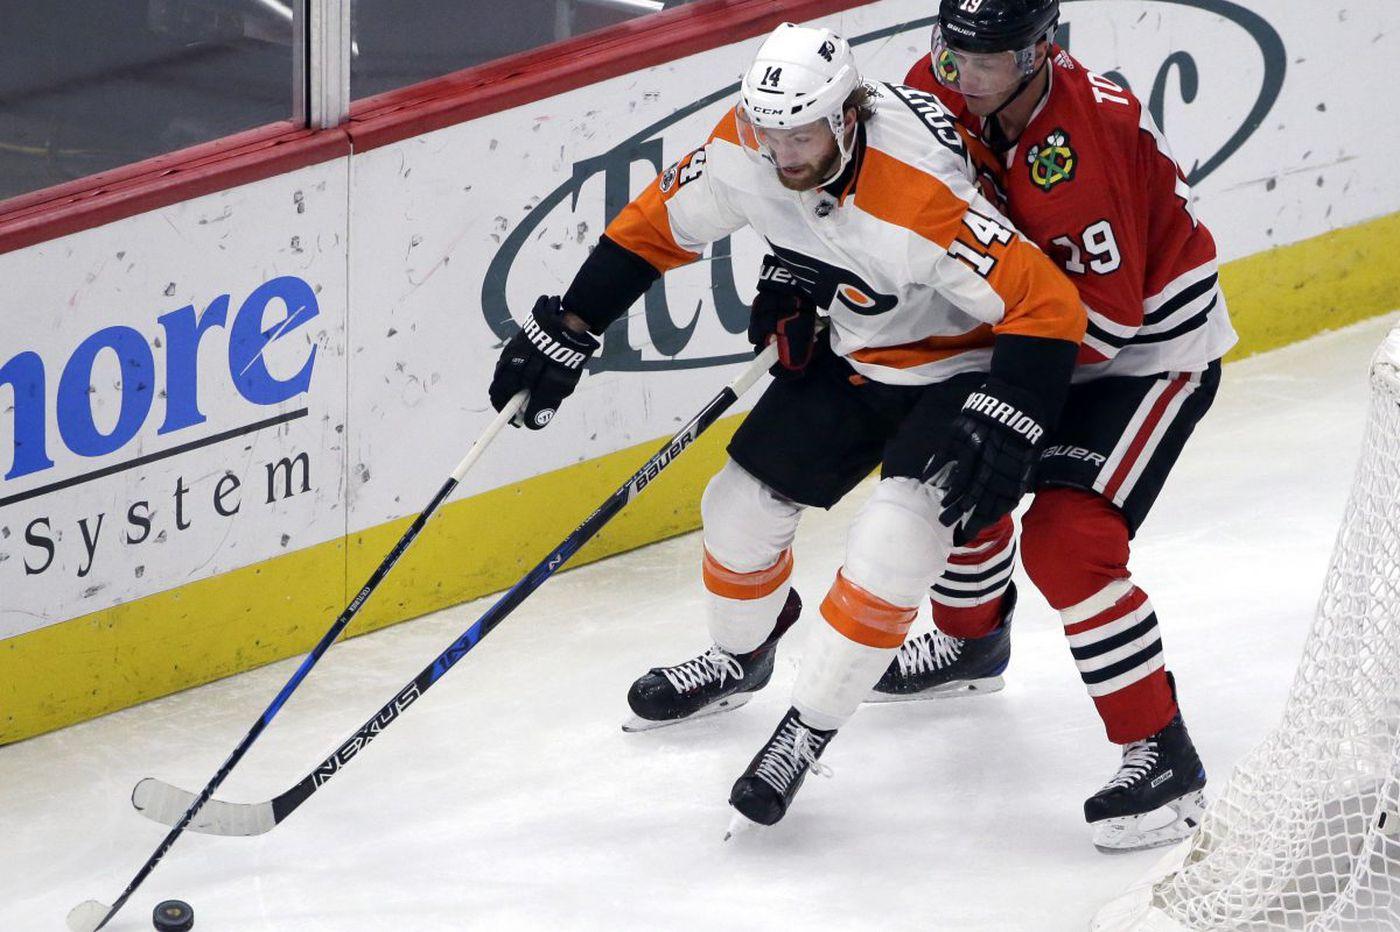 Radko Gudas injured as Flyers fall to Corey Crawford, Blackhawks